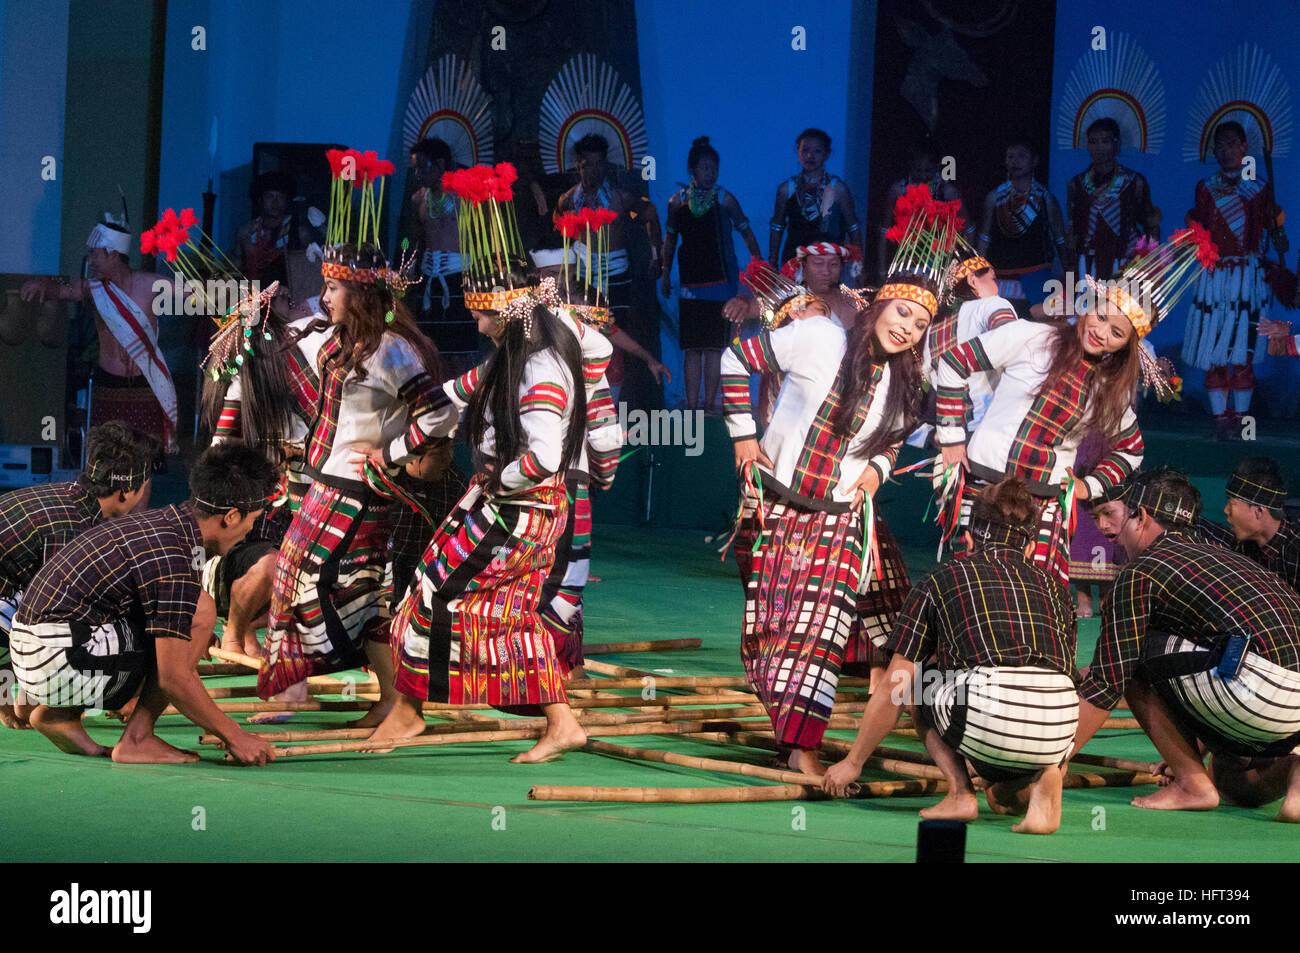 Mizoram dancers performing in 'Colours of NE India' at the Sangai Festival, Imphal, India - Stock Image